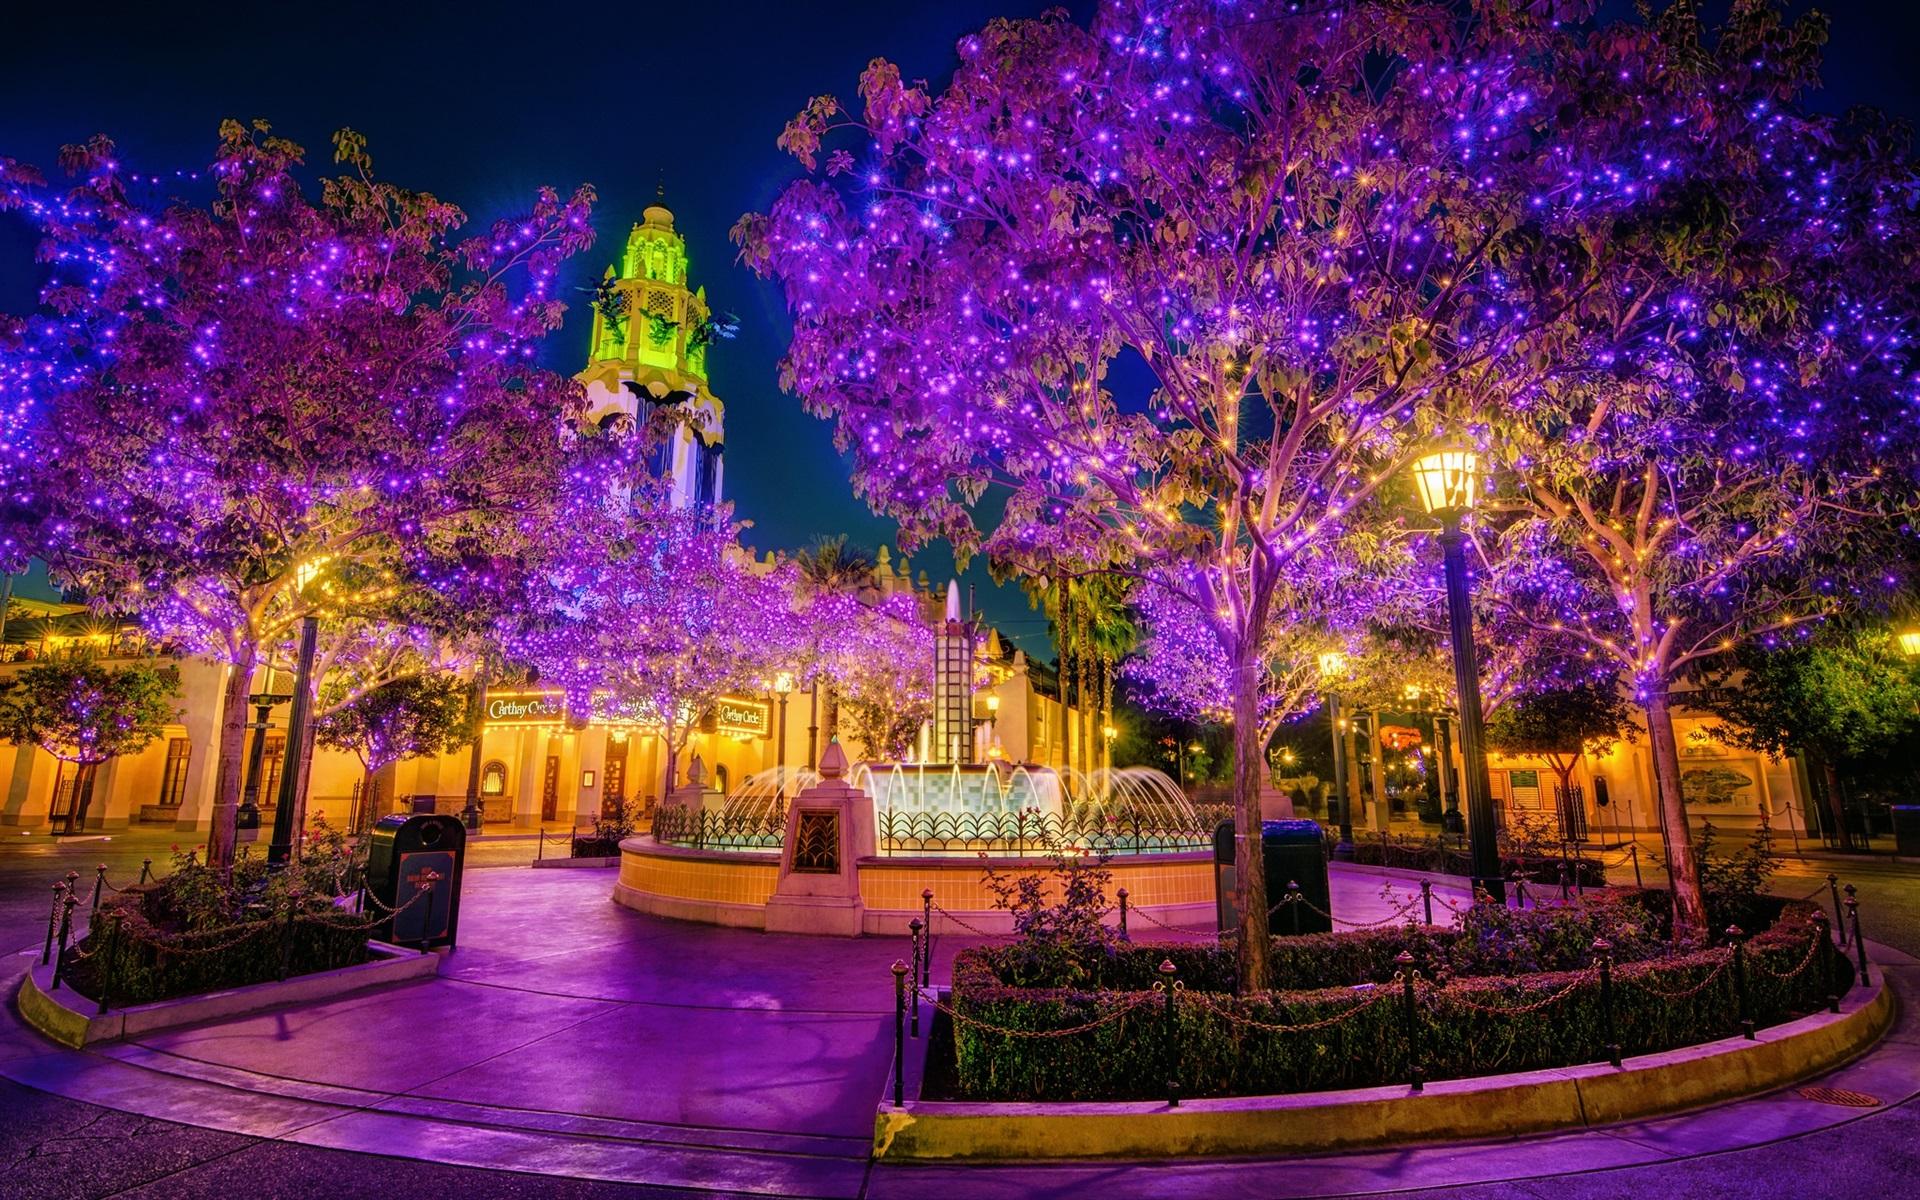 wallpaper city, park, night, beautiful holiday lights 1920x1200 hd